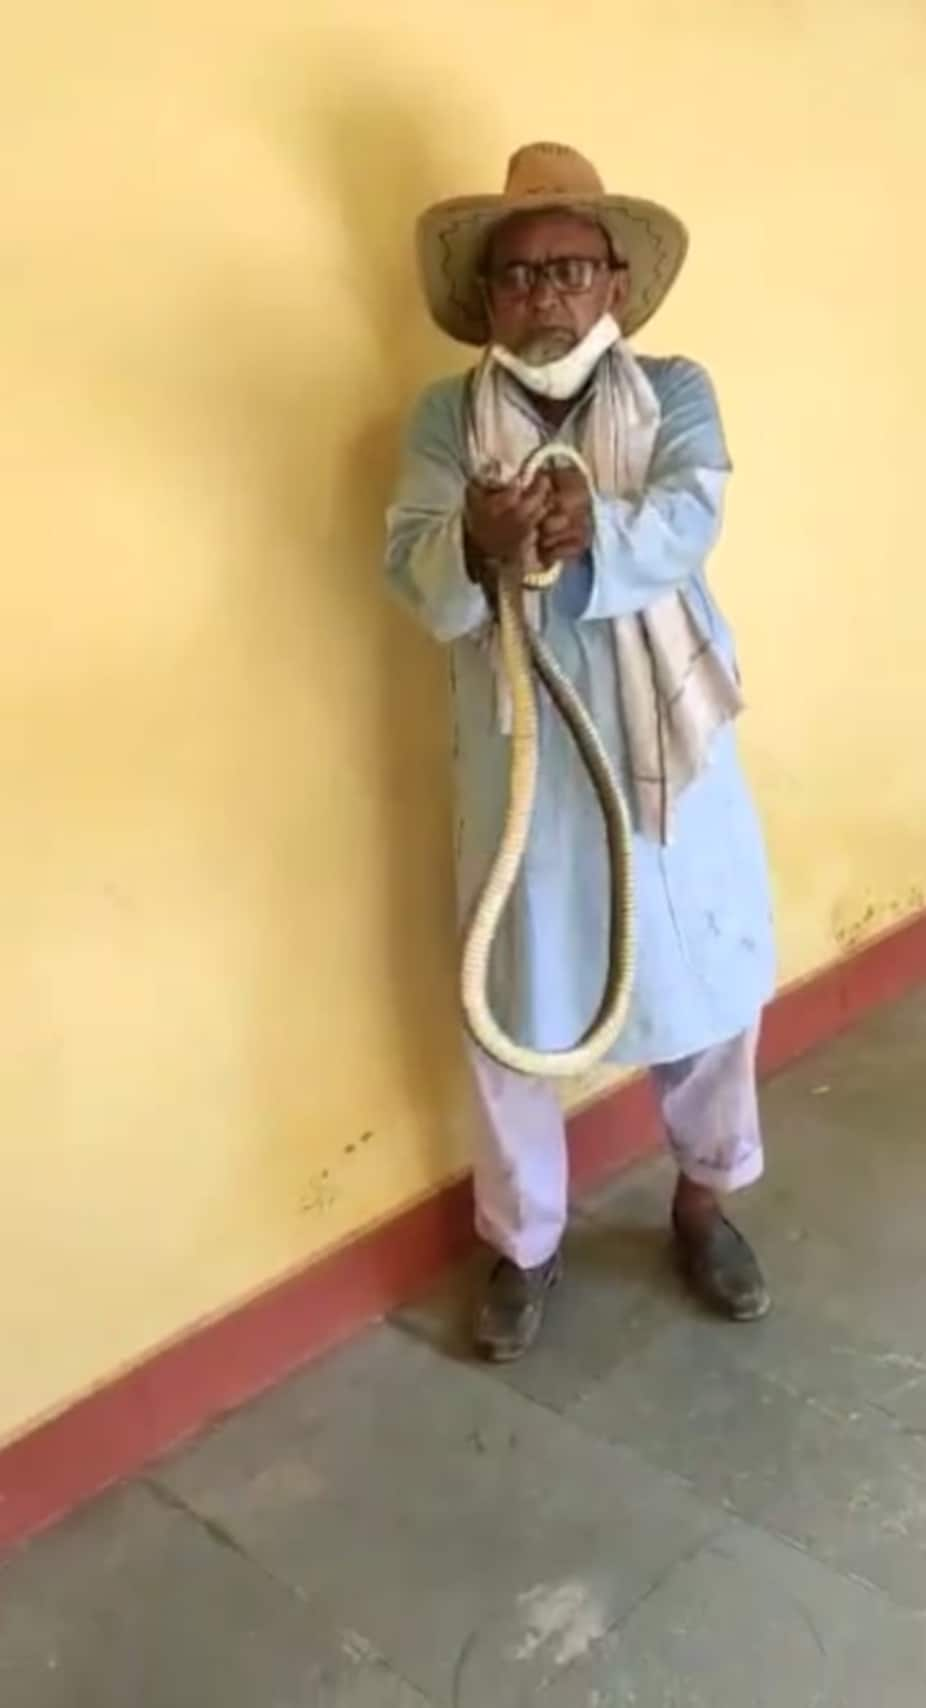 rajasthan news,Bundi latest news, snake man,Cobra Man of Rajasthan, cobra man photos, snake photos,Cobra ManDurgalal Meena, सांप ने डंसा, सांप के फोटो, कोबरा मैन, राजस्थान के कोबरा मैन